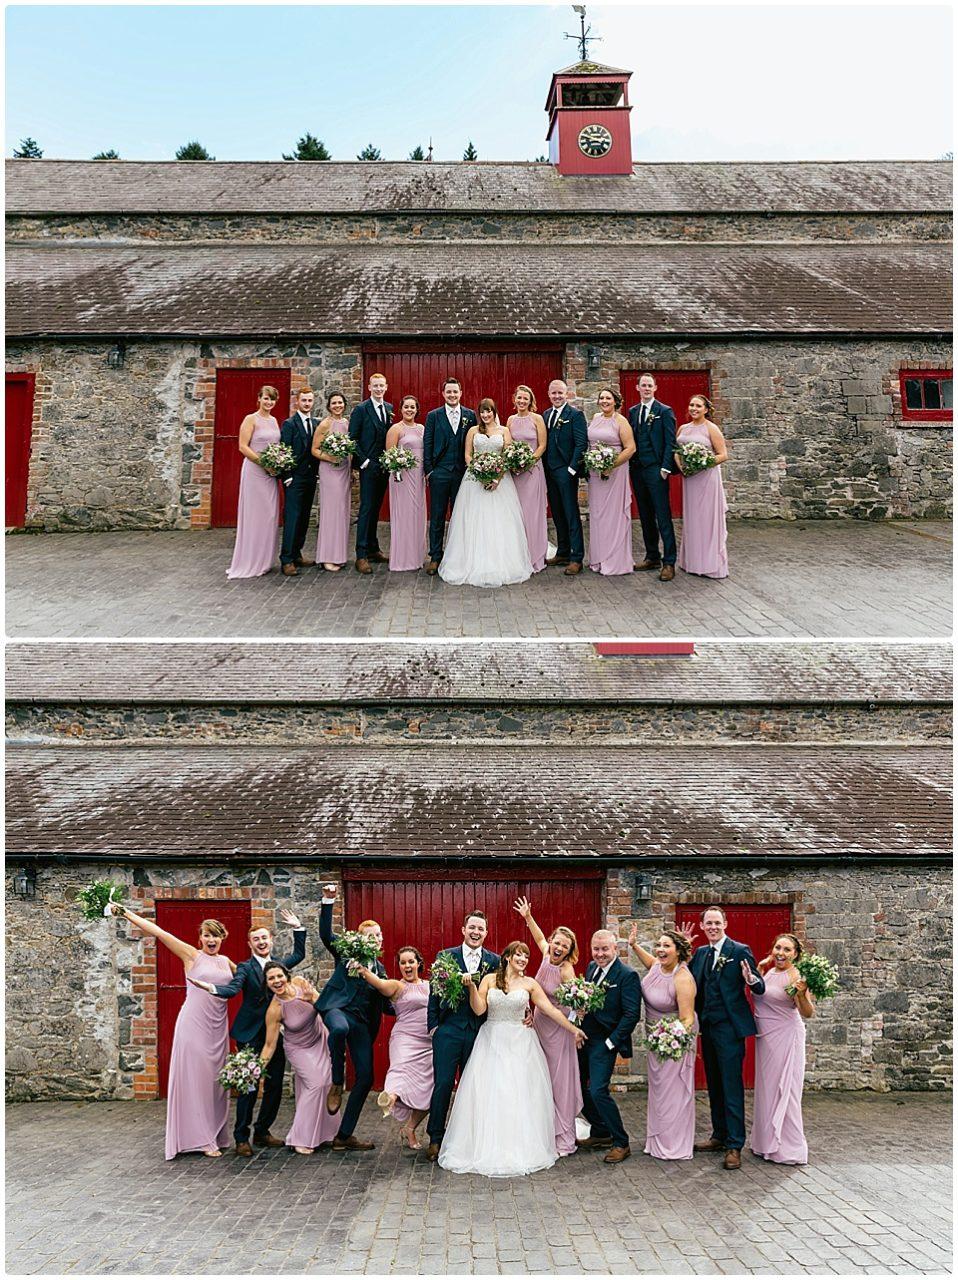 jade conor wedding photography larchfield estate 0153